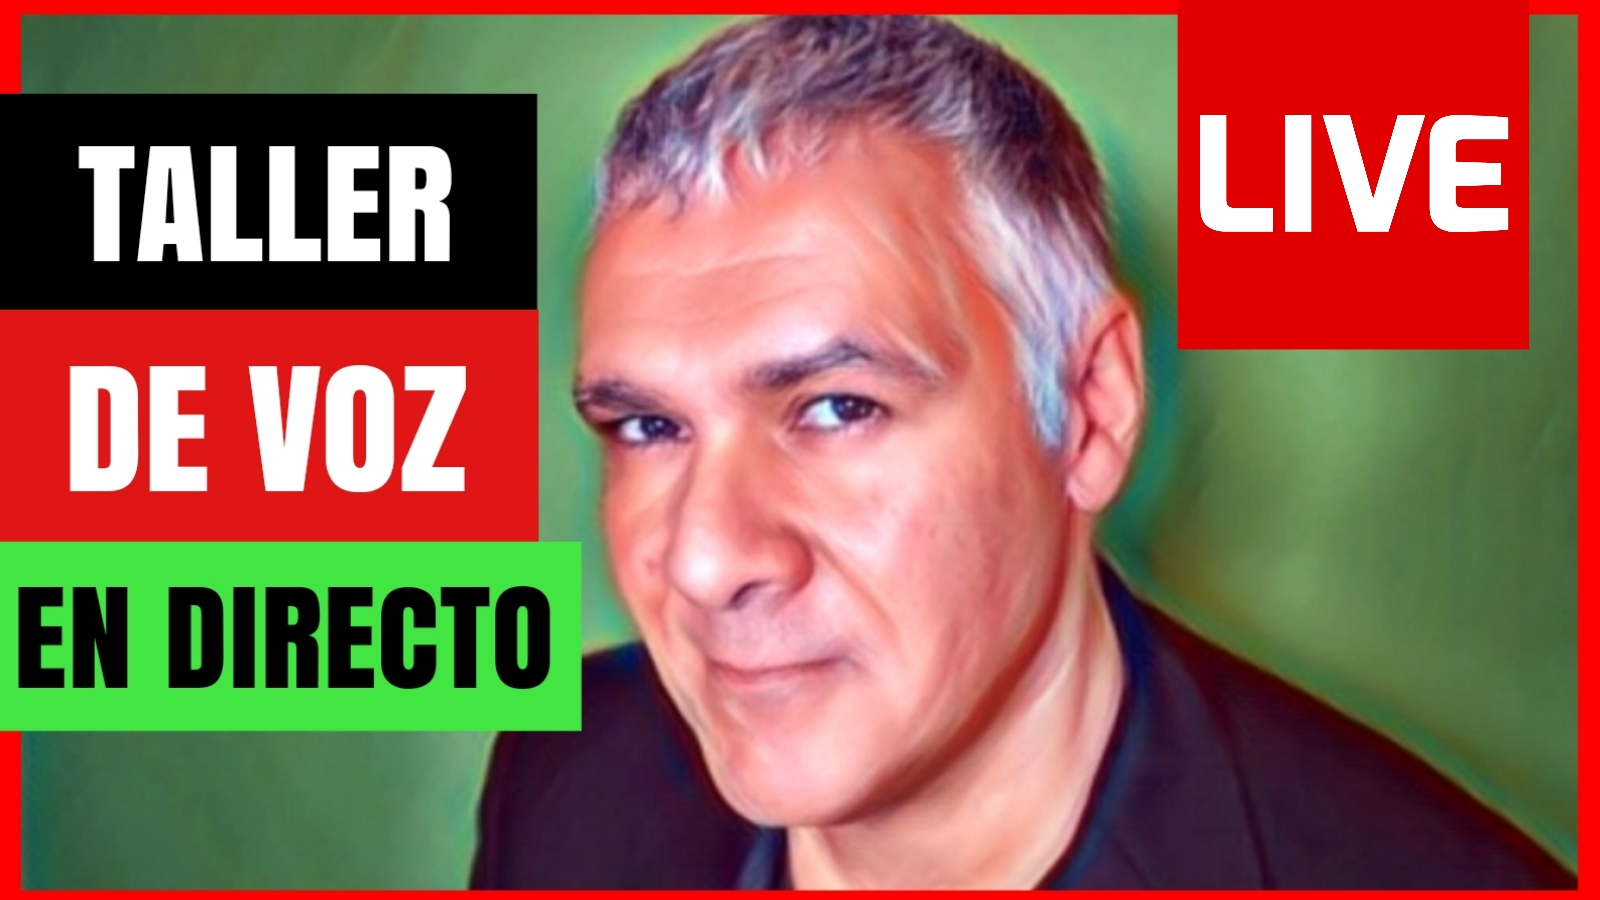 TALLER DE VOZ EN DIRECTO – LOCUTOR PROFESIONAL GUILLERMO MORANTE